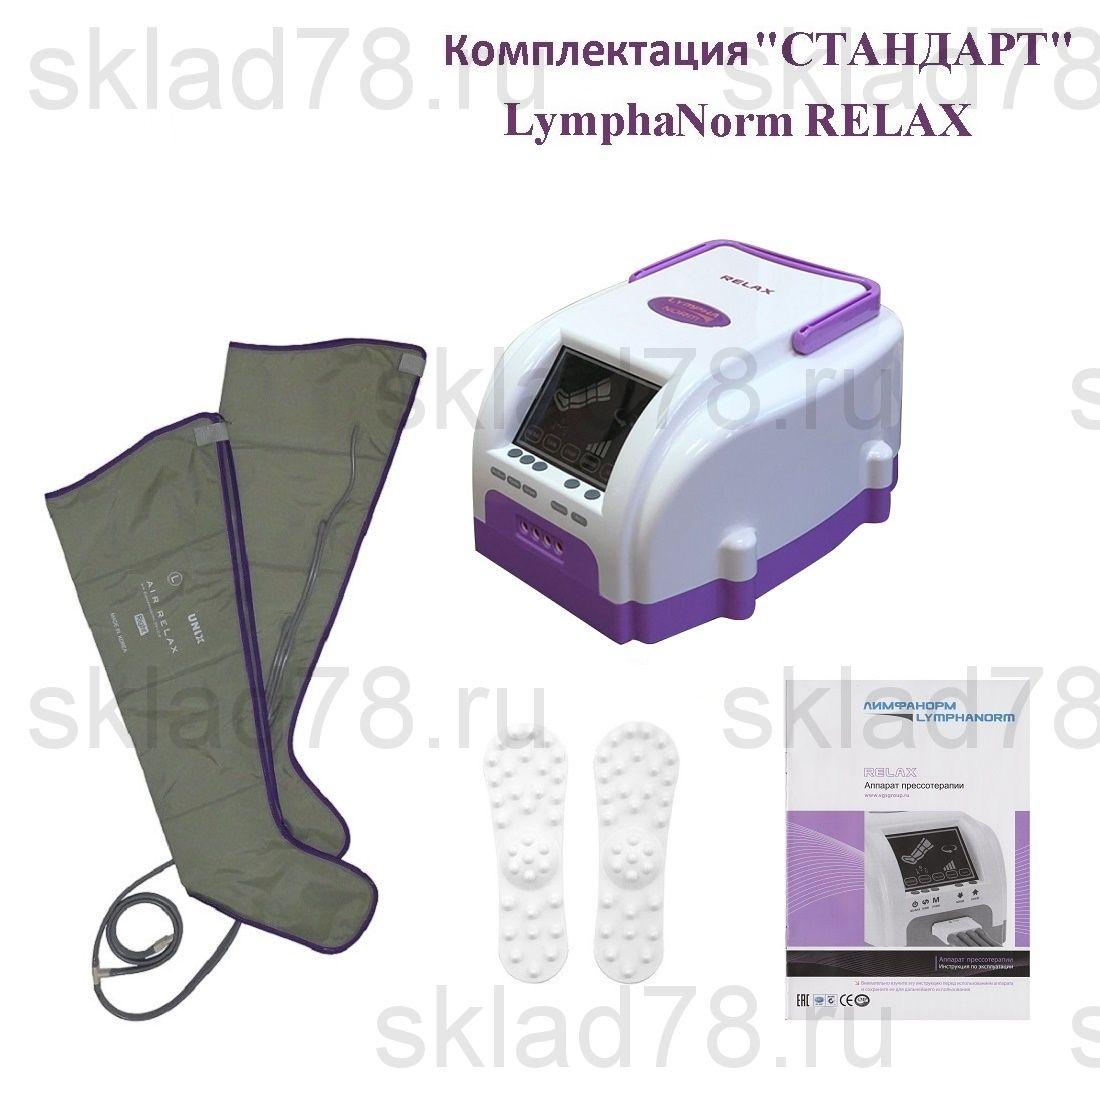 "LymphaNorm RELAX Лимфодренаж комплект ""Стандарт"""